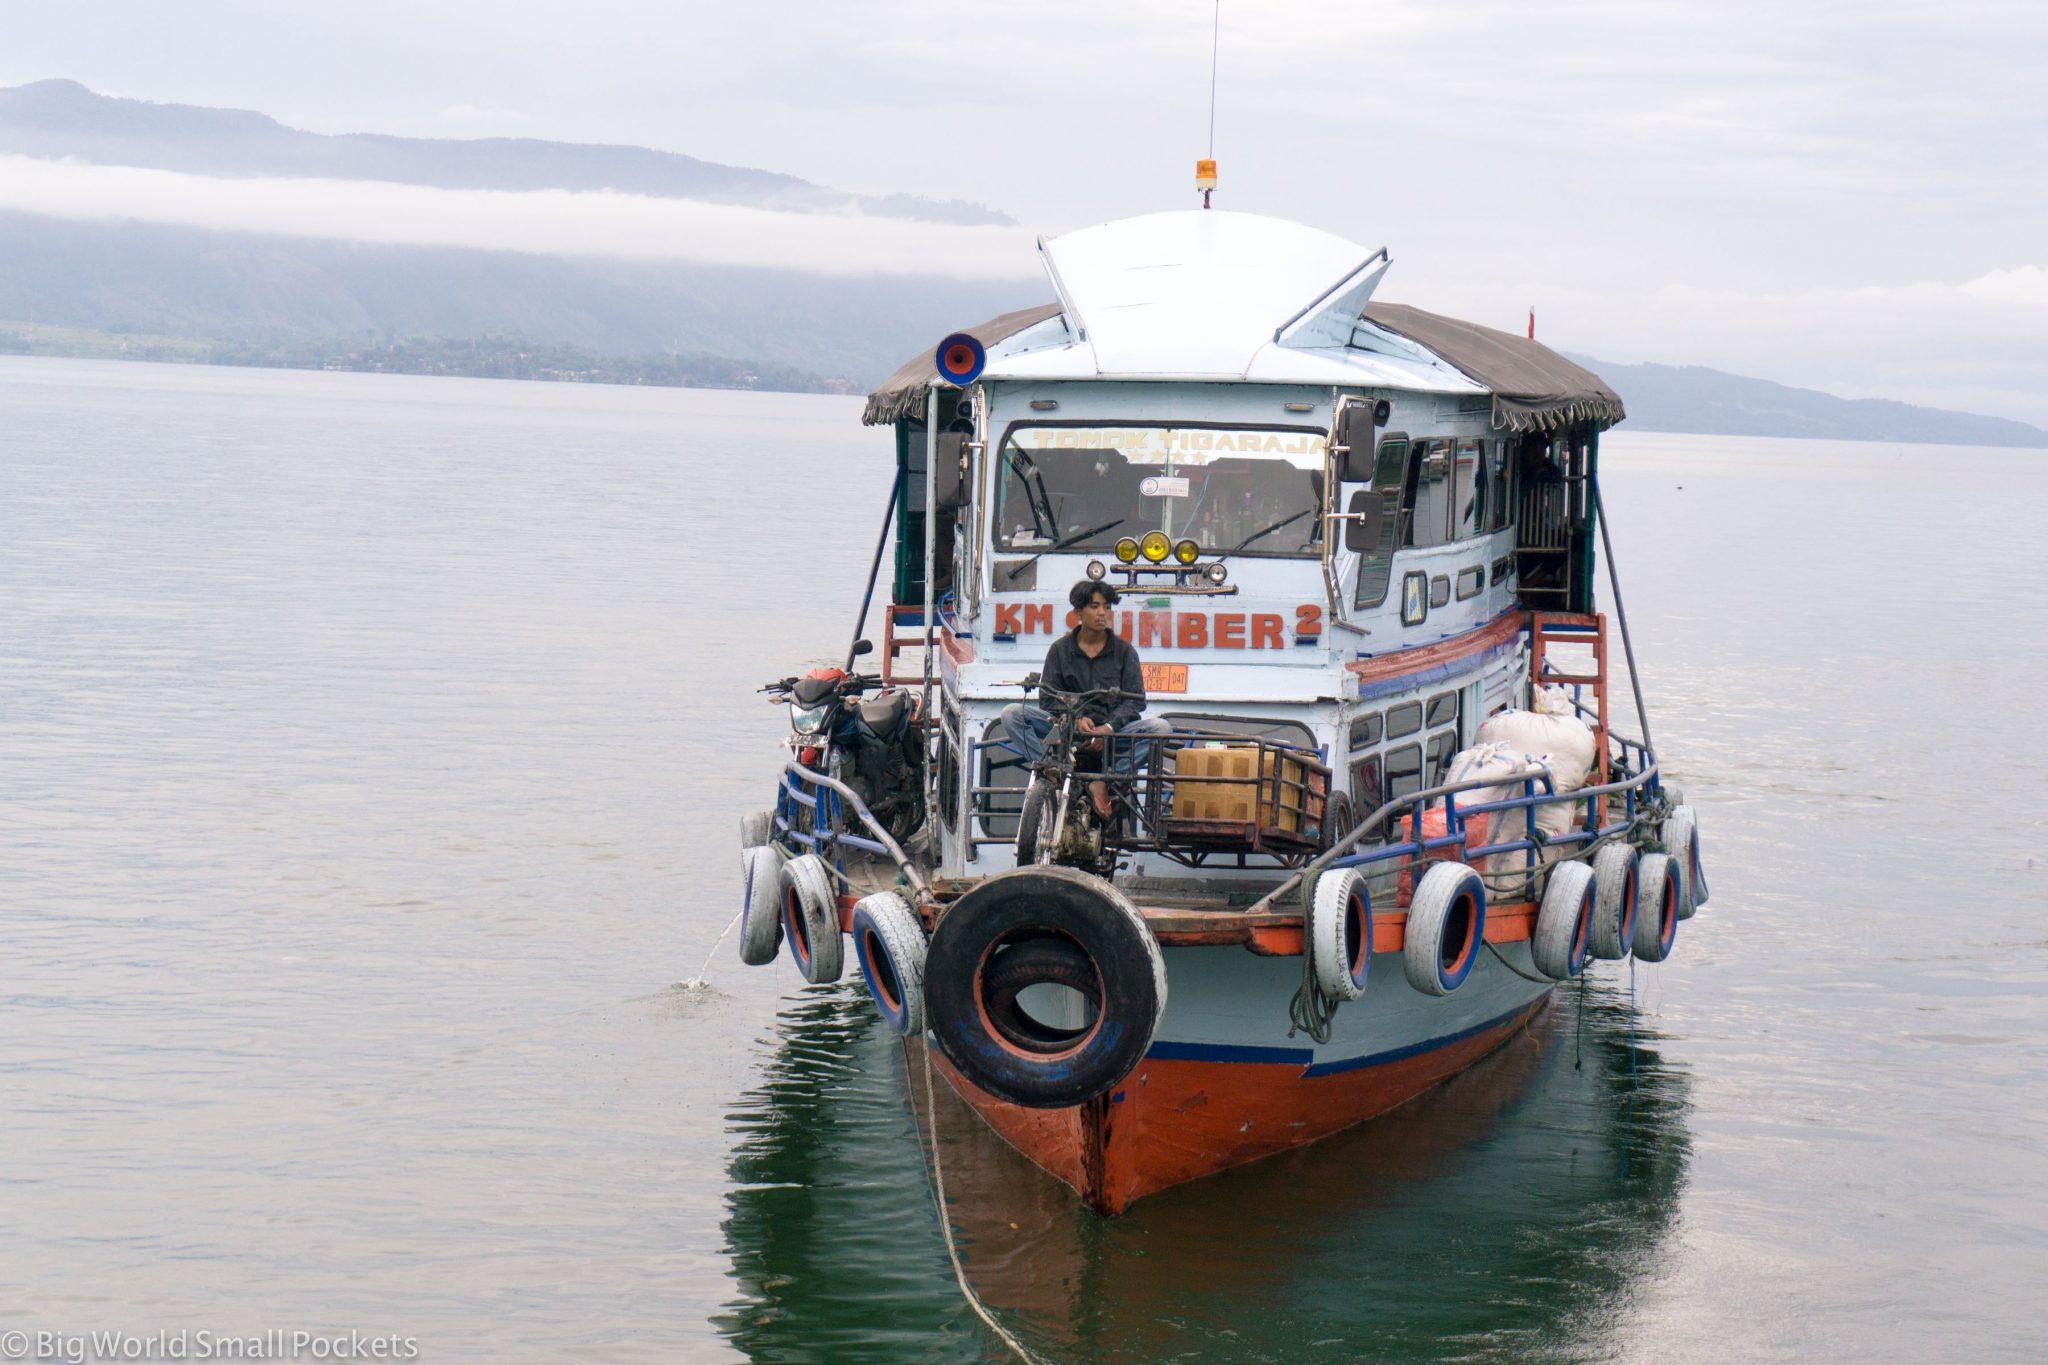 Indonesia, Lake Toba, Boat